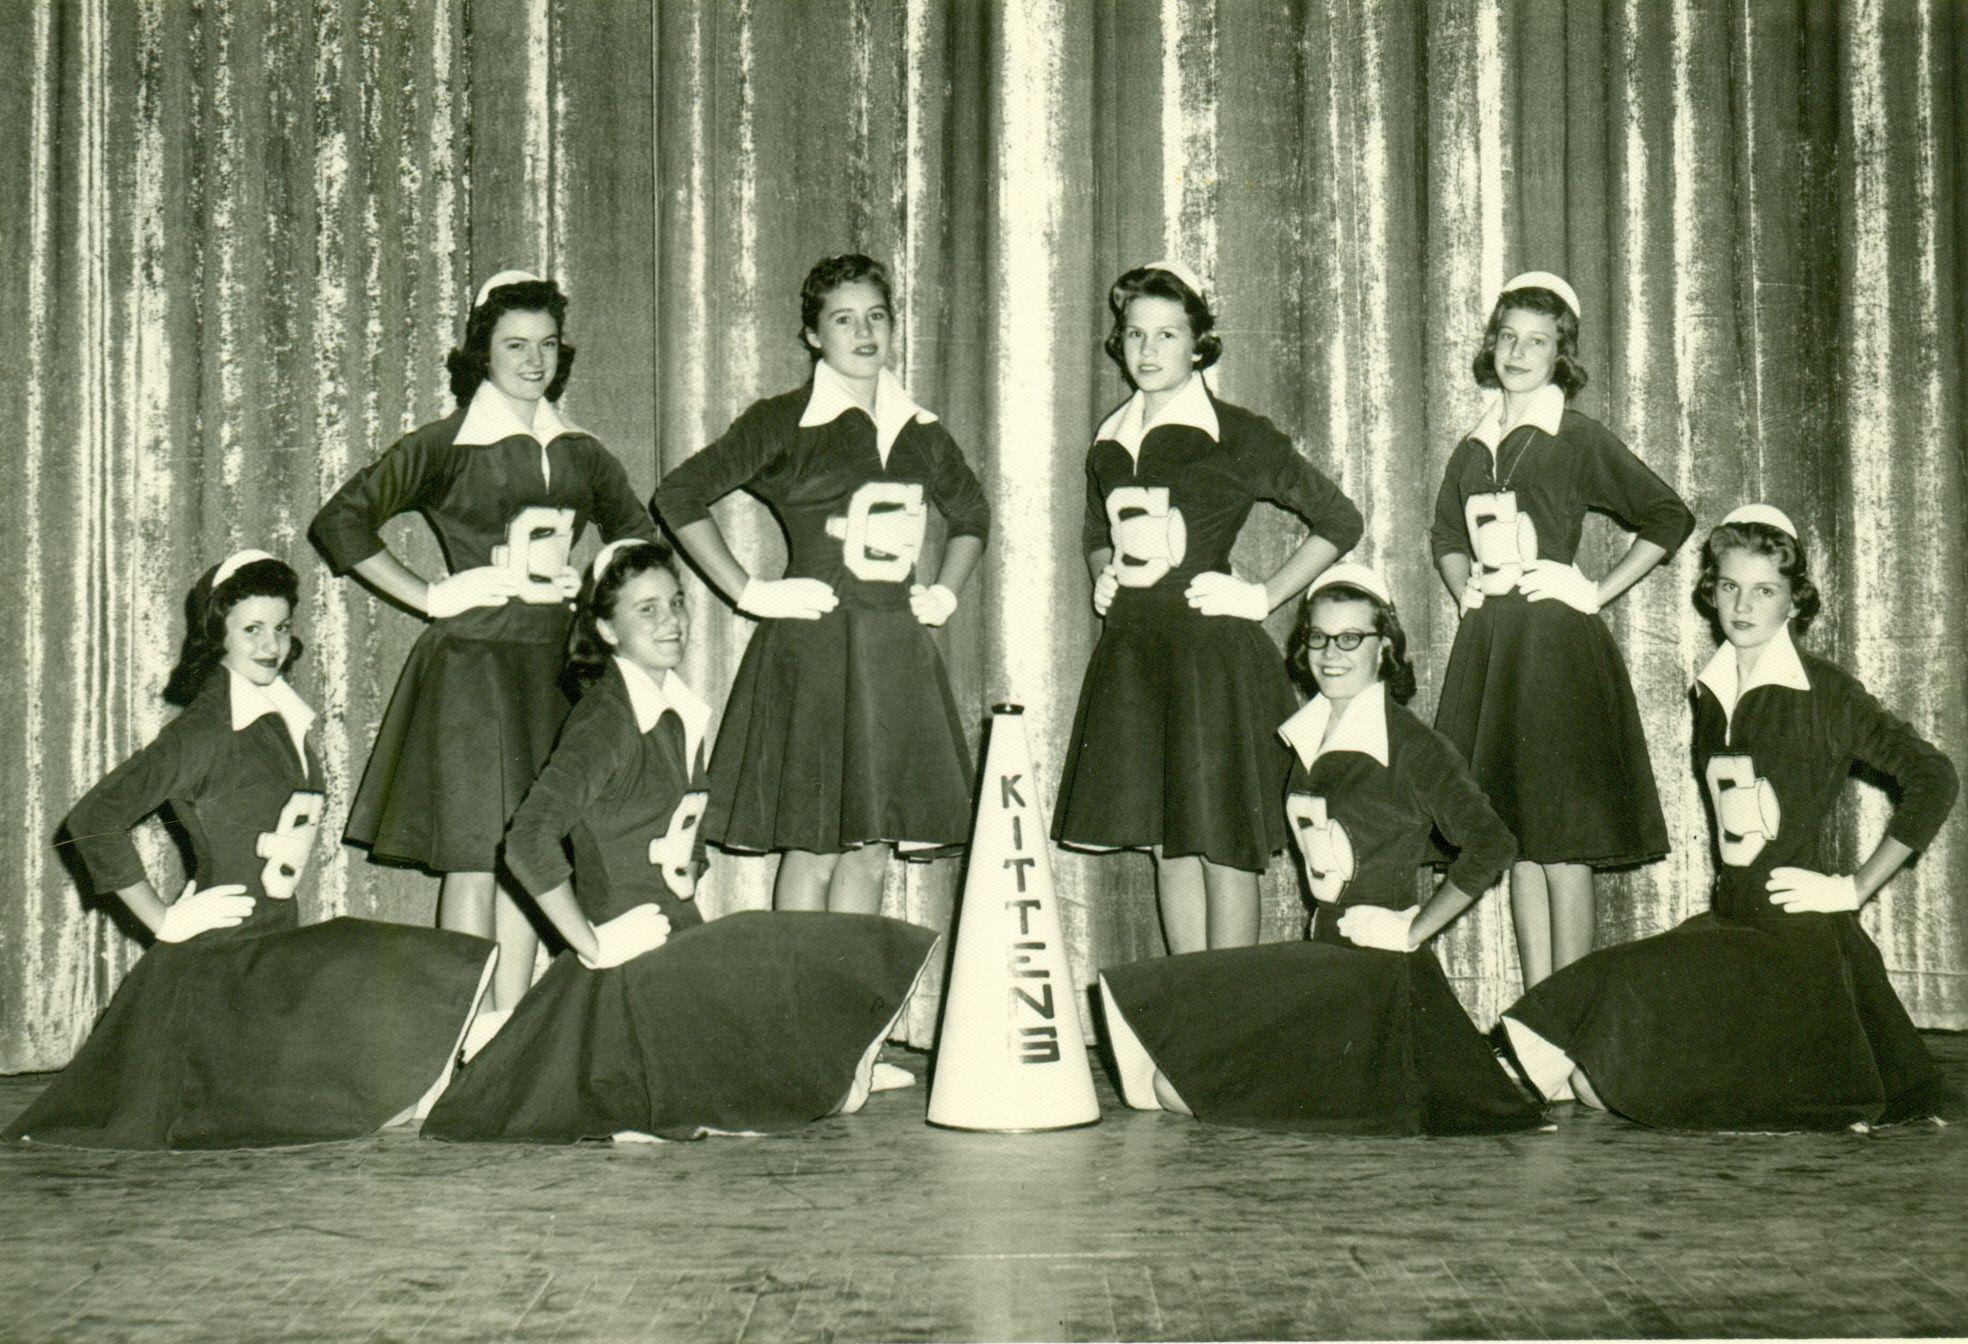 New mexico curry county clovis - Clovis Junior High School Cheerleaders 1957 58 Clovis New Mexico